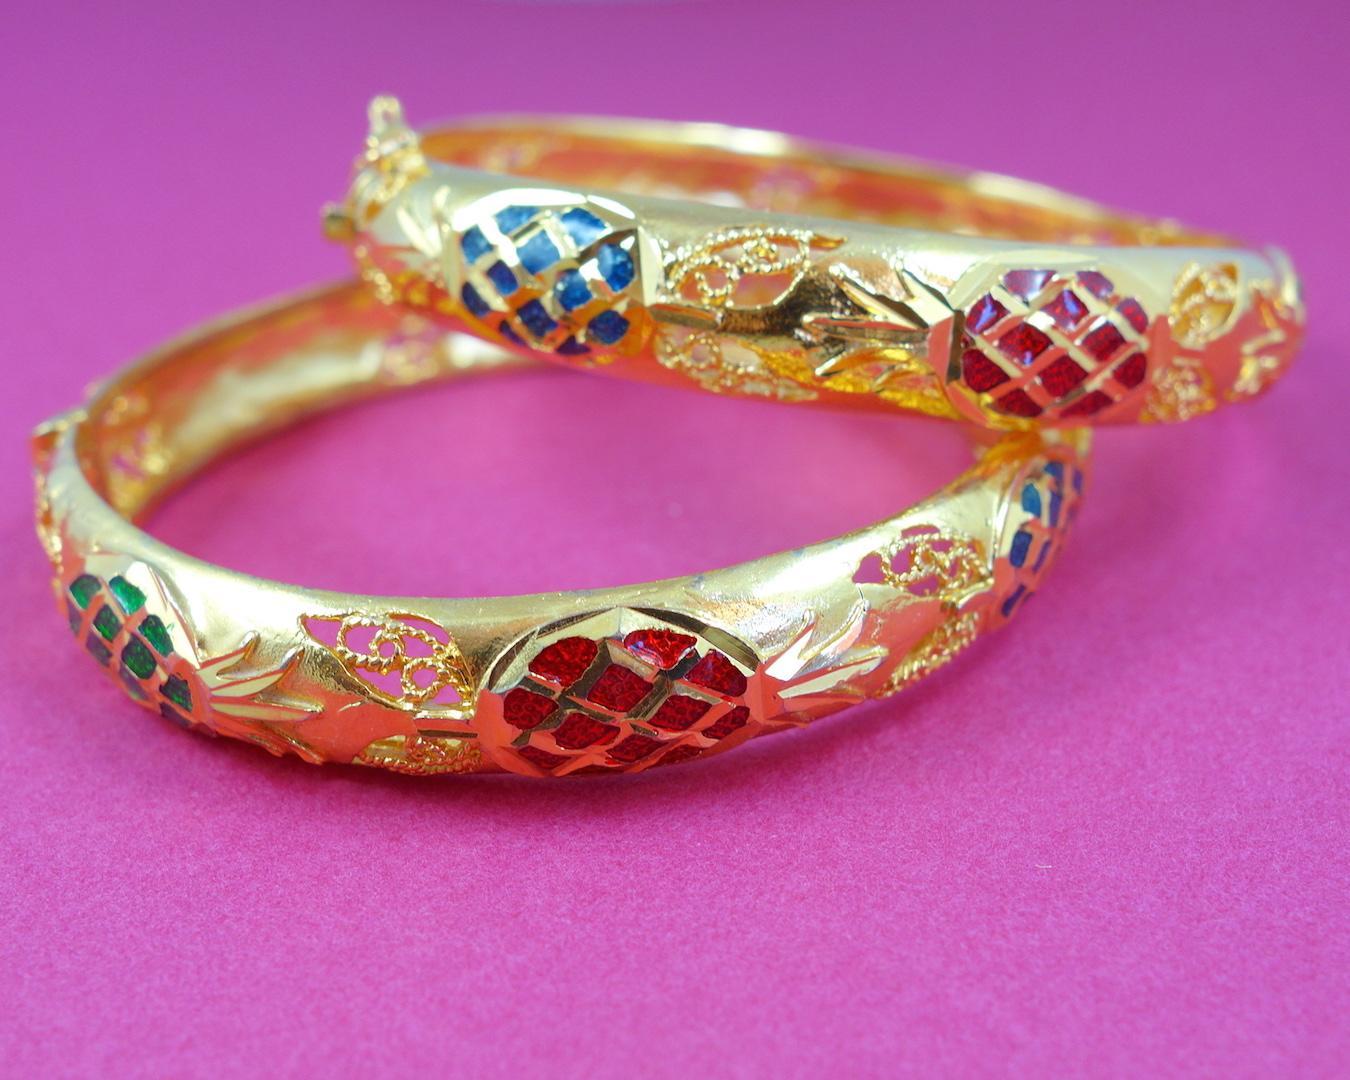 bracelet-jonc-ananas-roulotte-or-colore